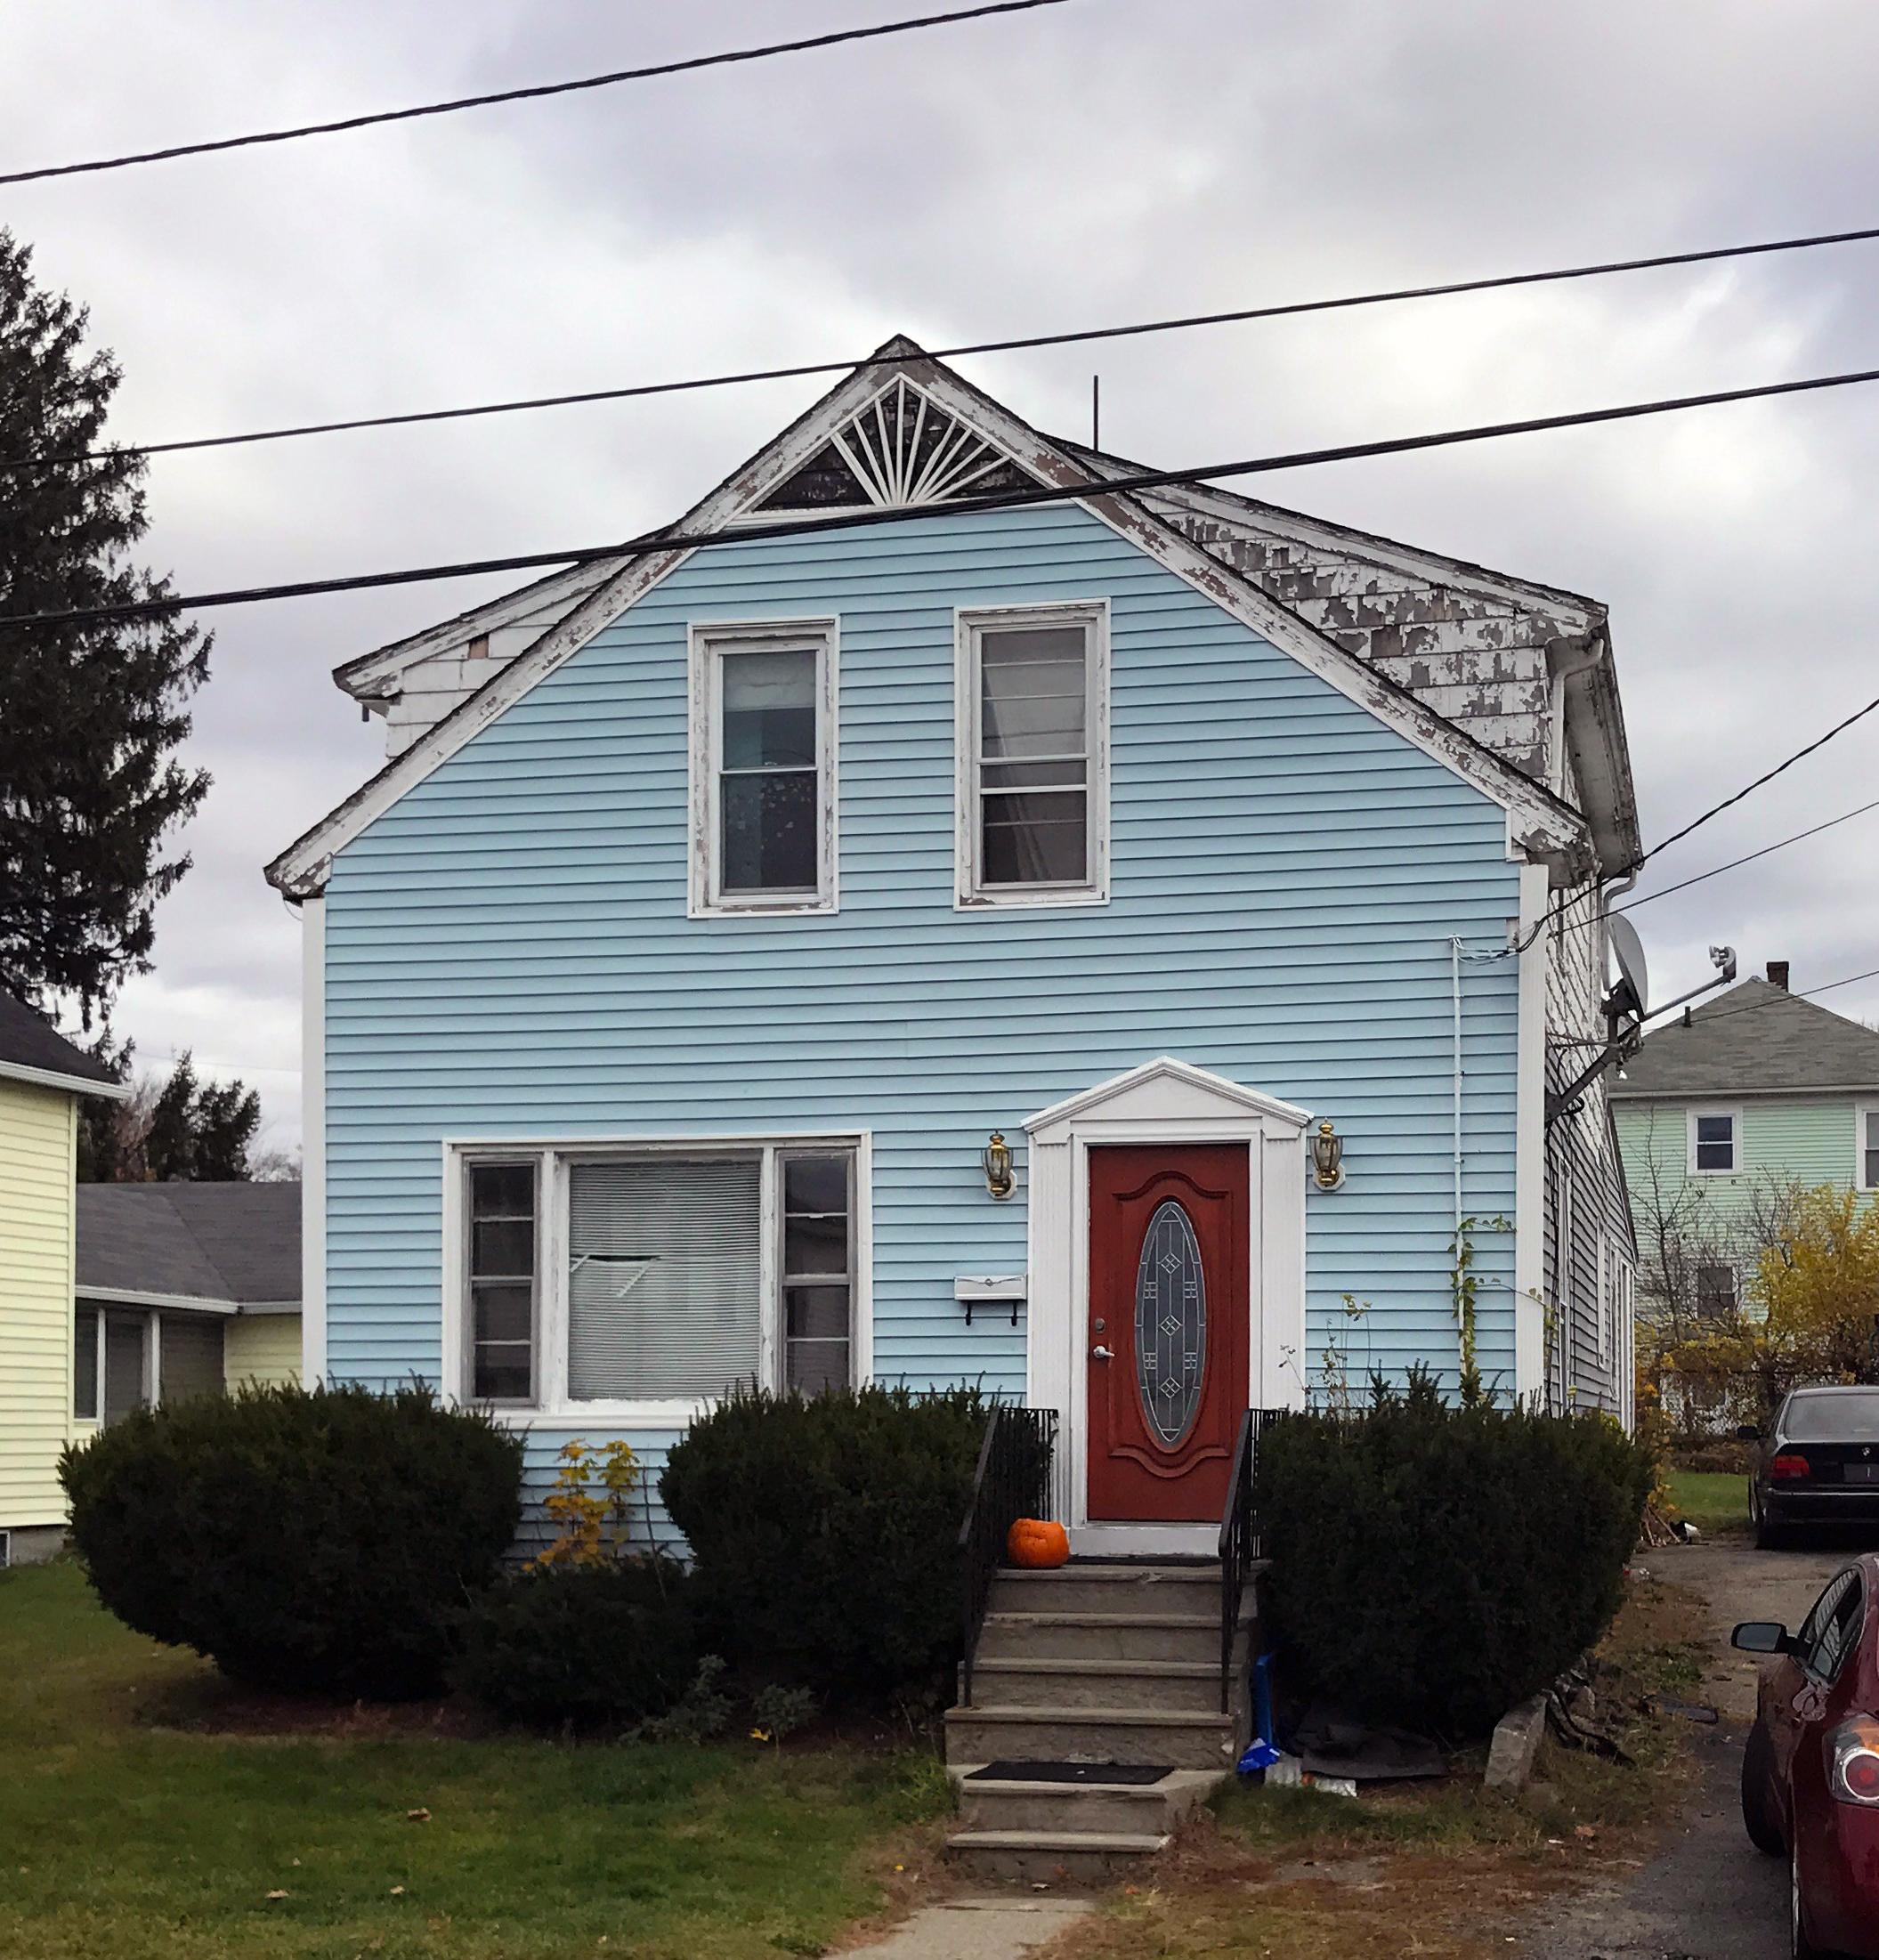 East Providence, RI - Closed May 19, 2017